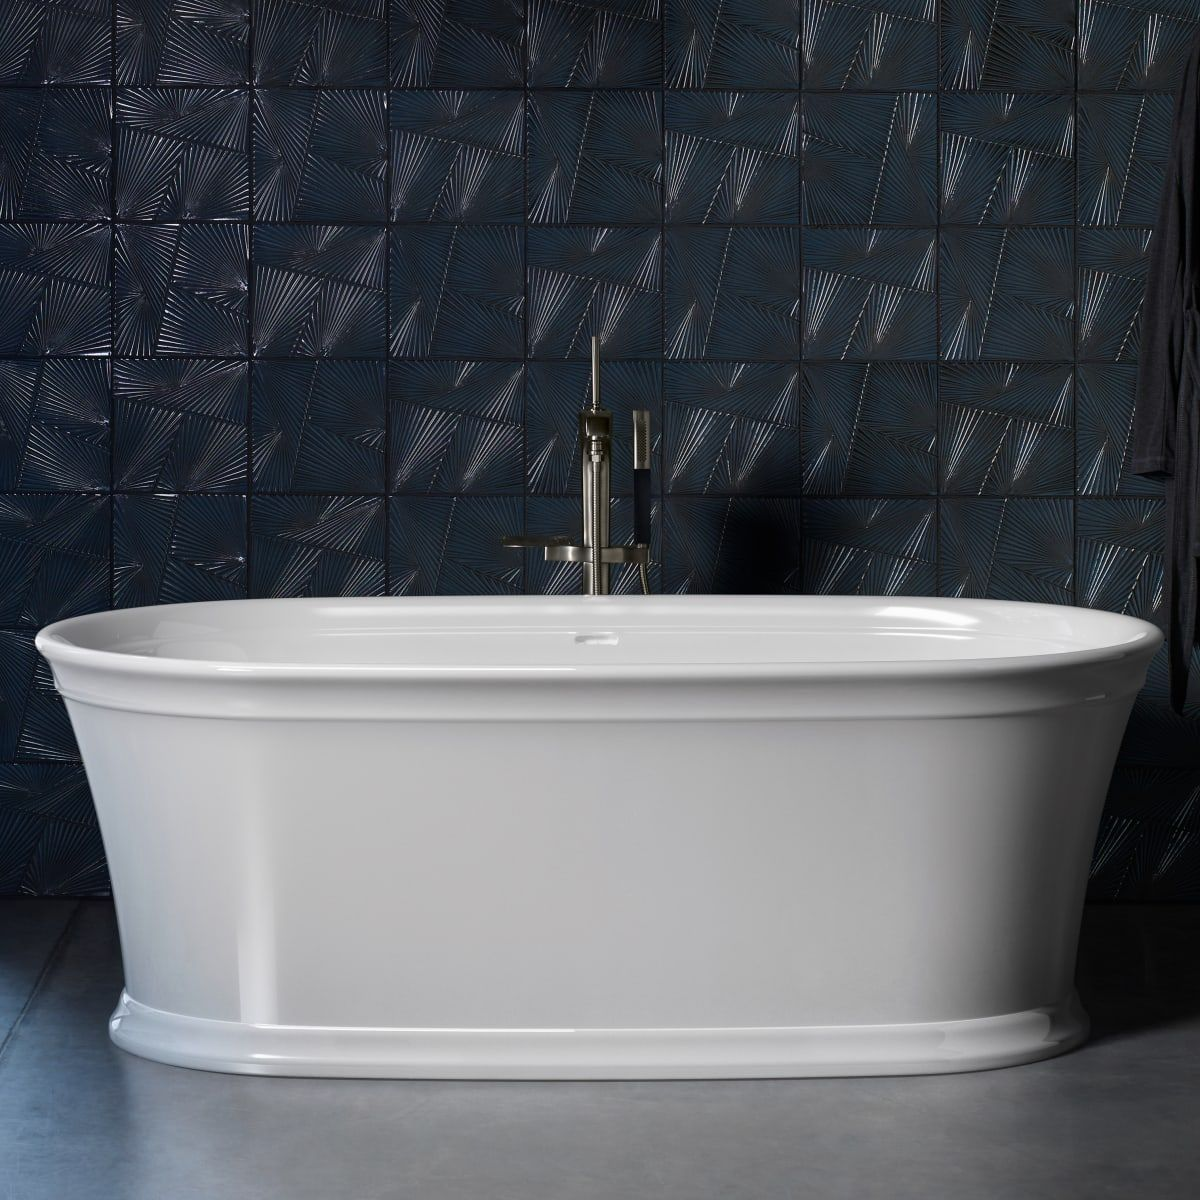 Kohler Memoirs And Margaux Bundle Build Com In 2020 Kohler Memoirs Soaking Bathtubs Tub Filler